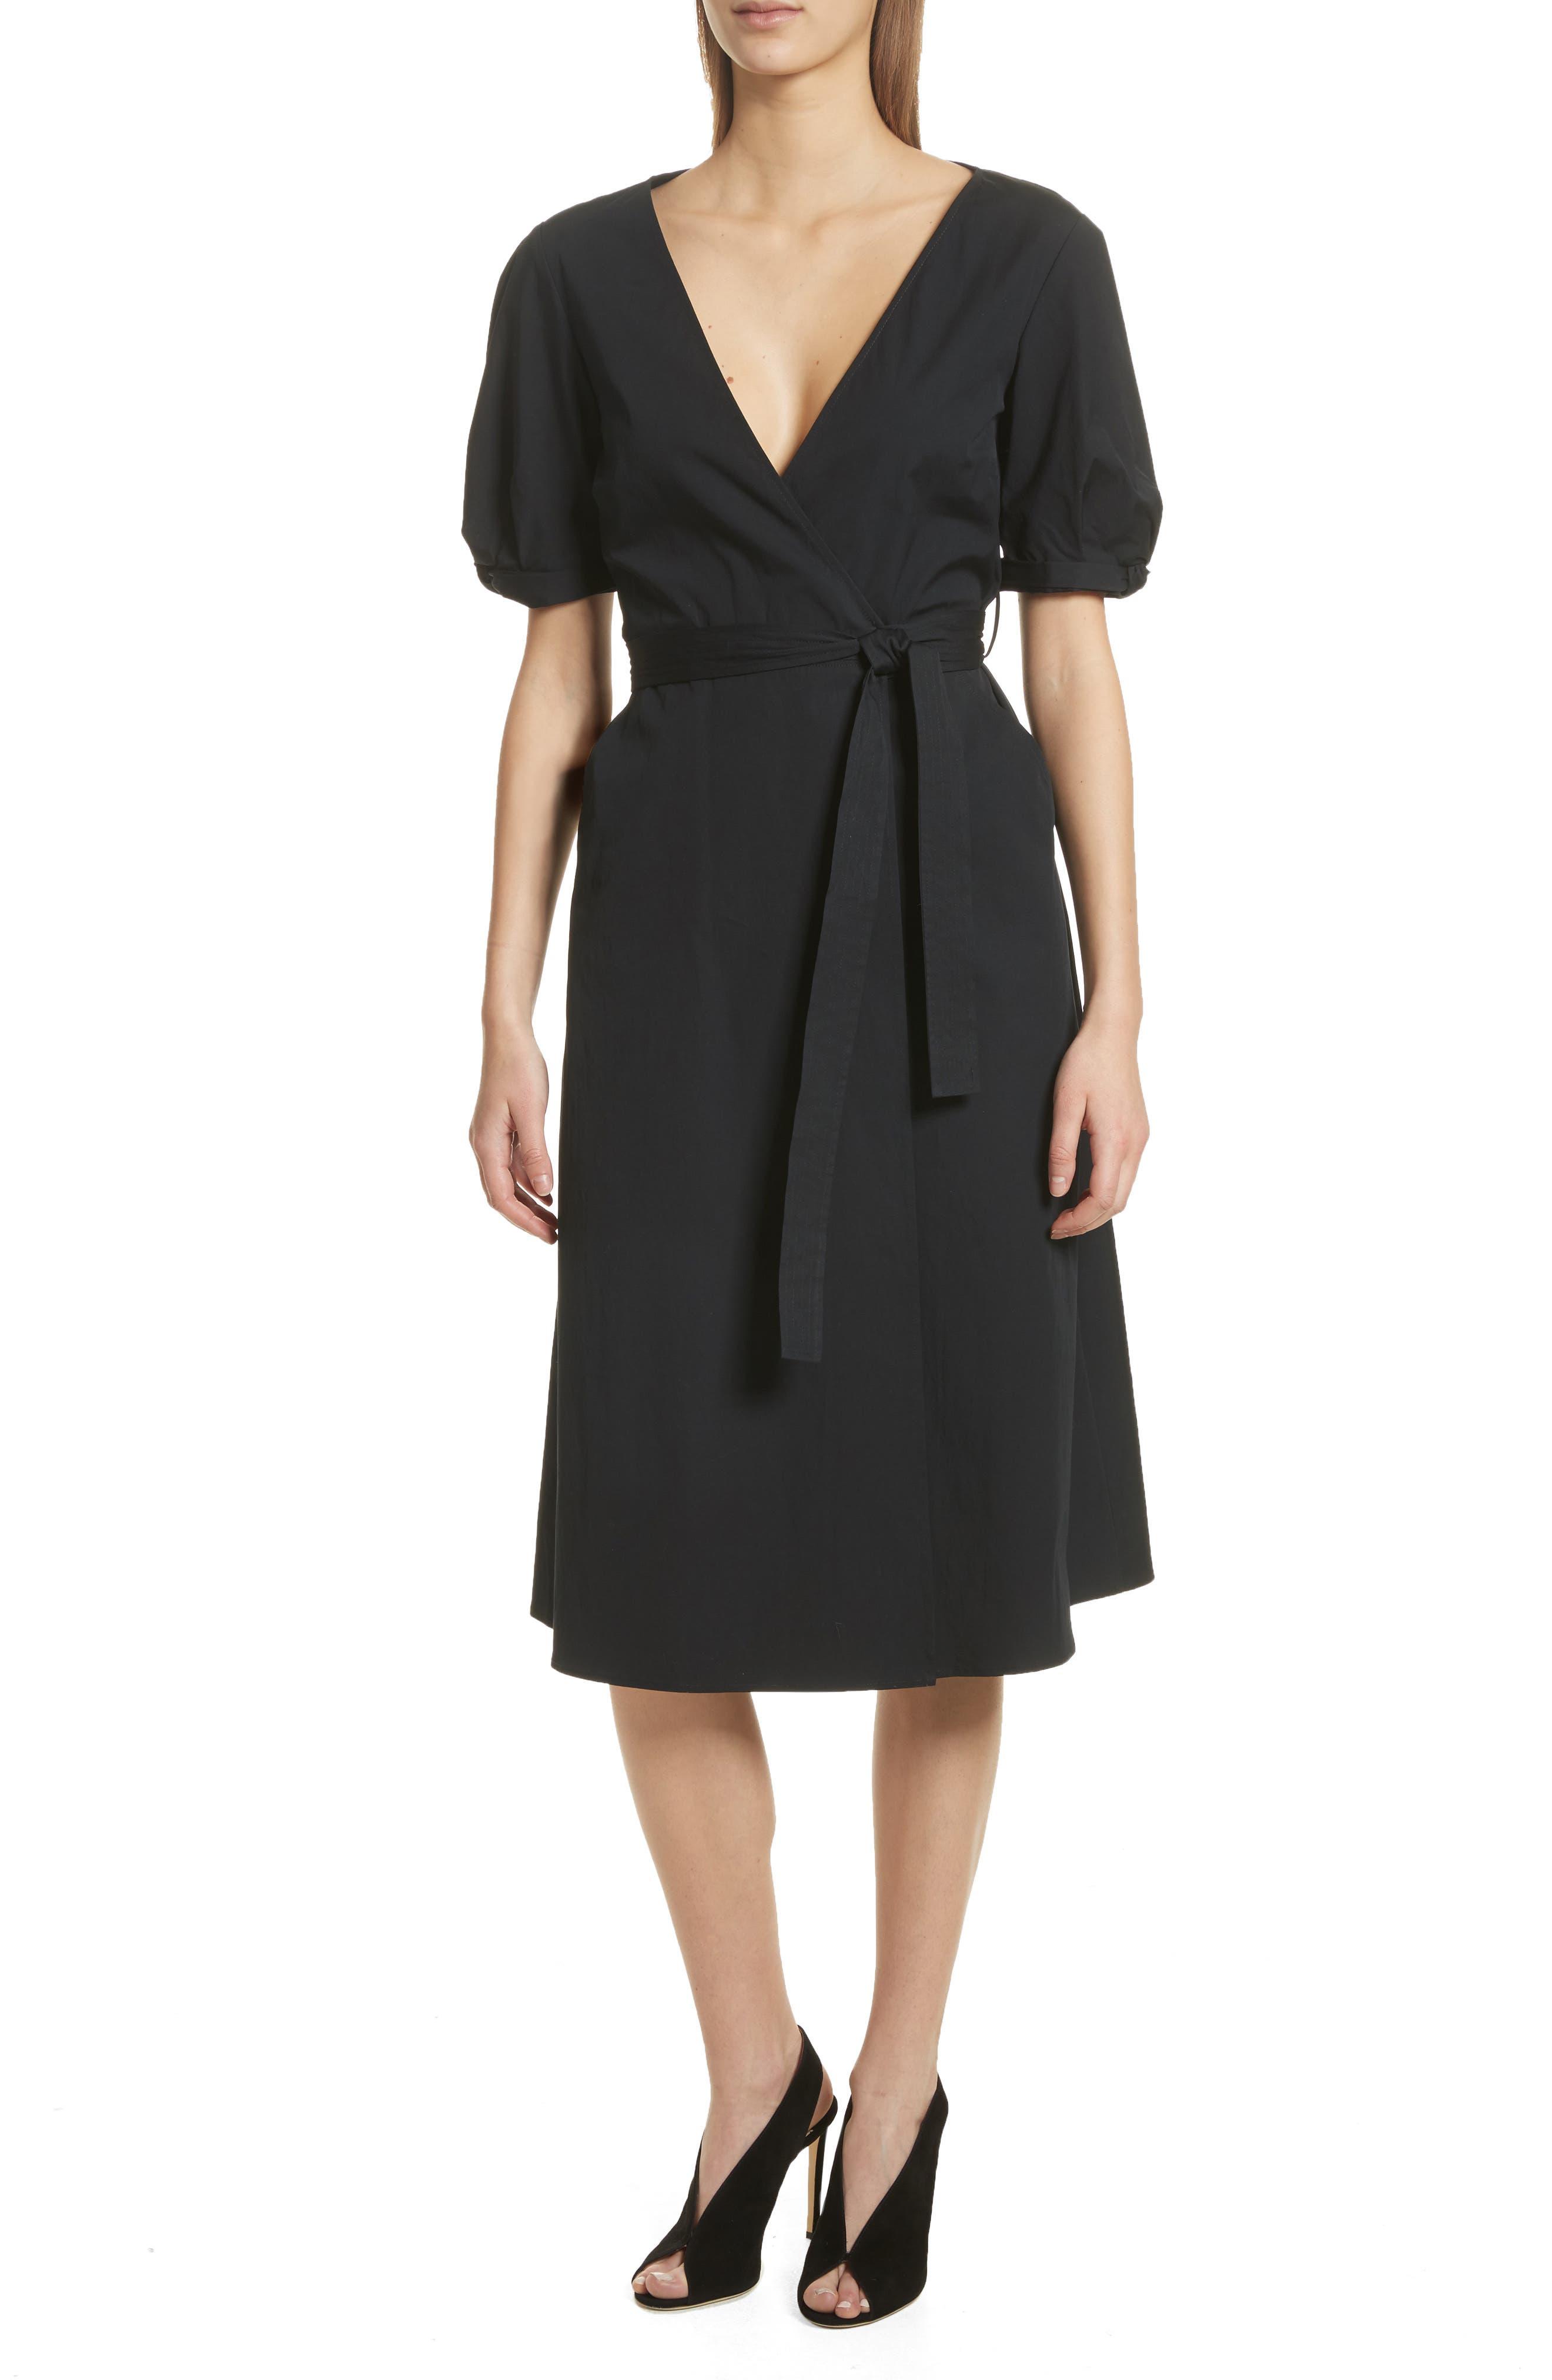 Alternate Image 1 Selected - A.L.C. Meghan Wrap Dress